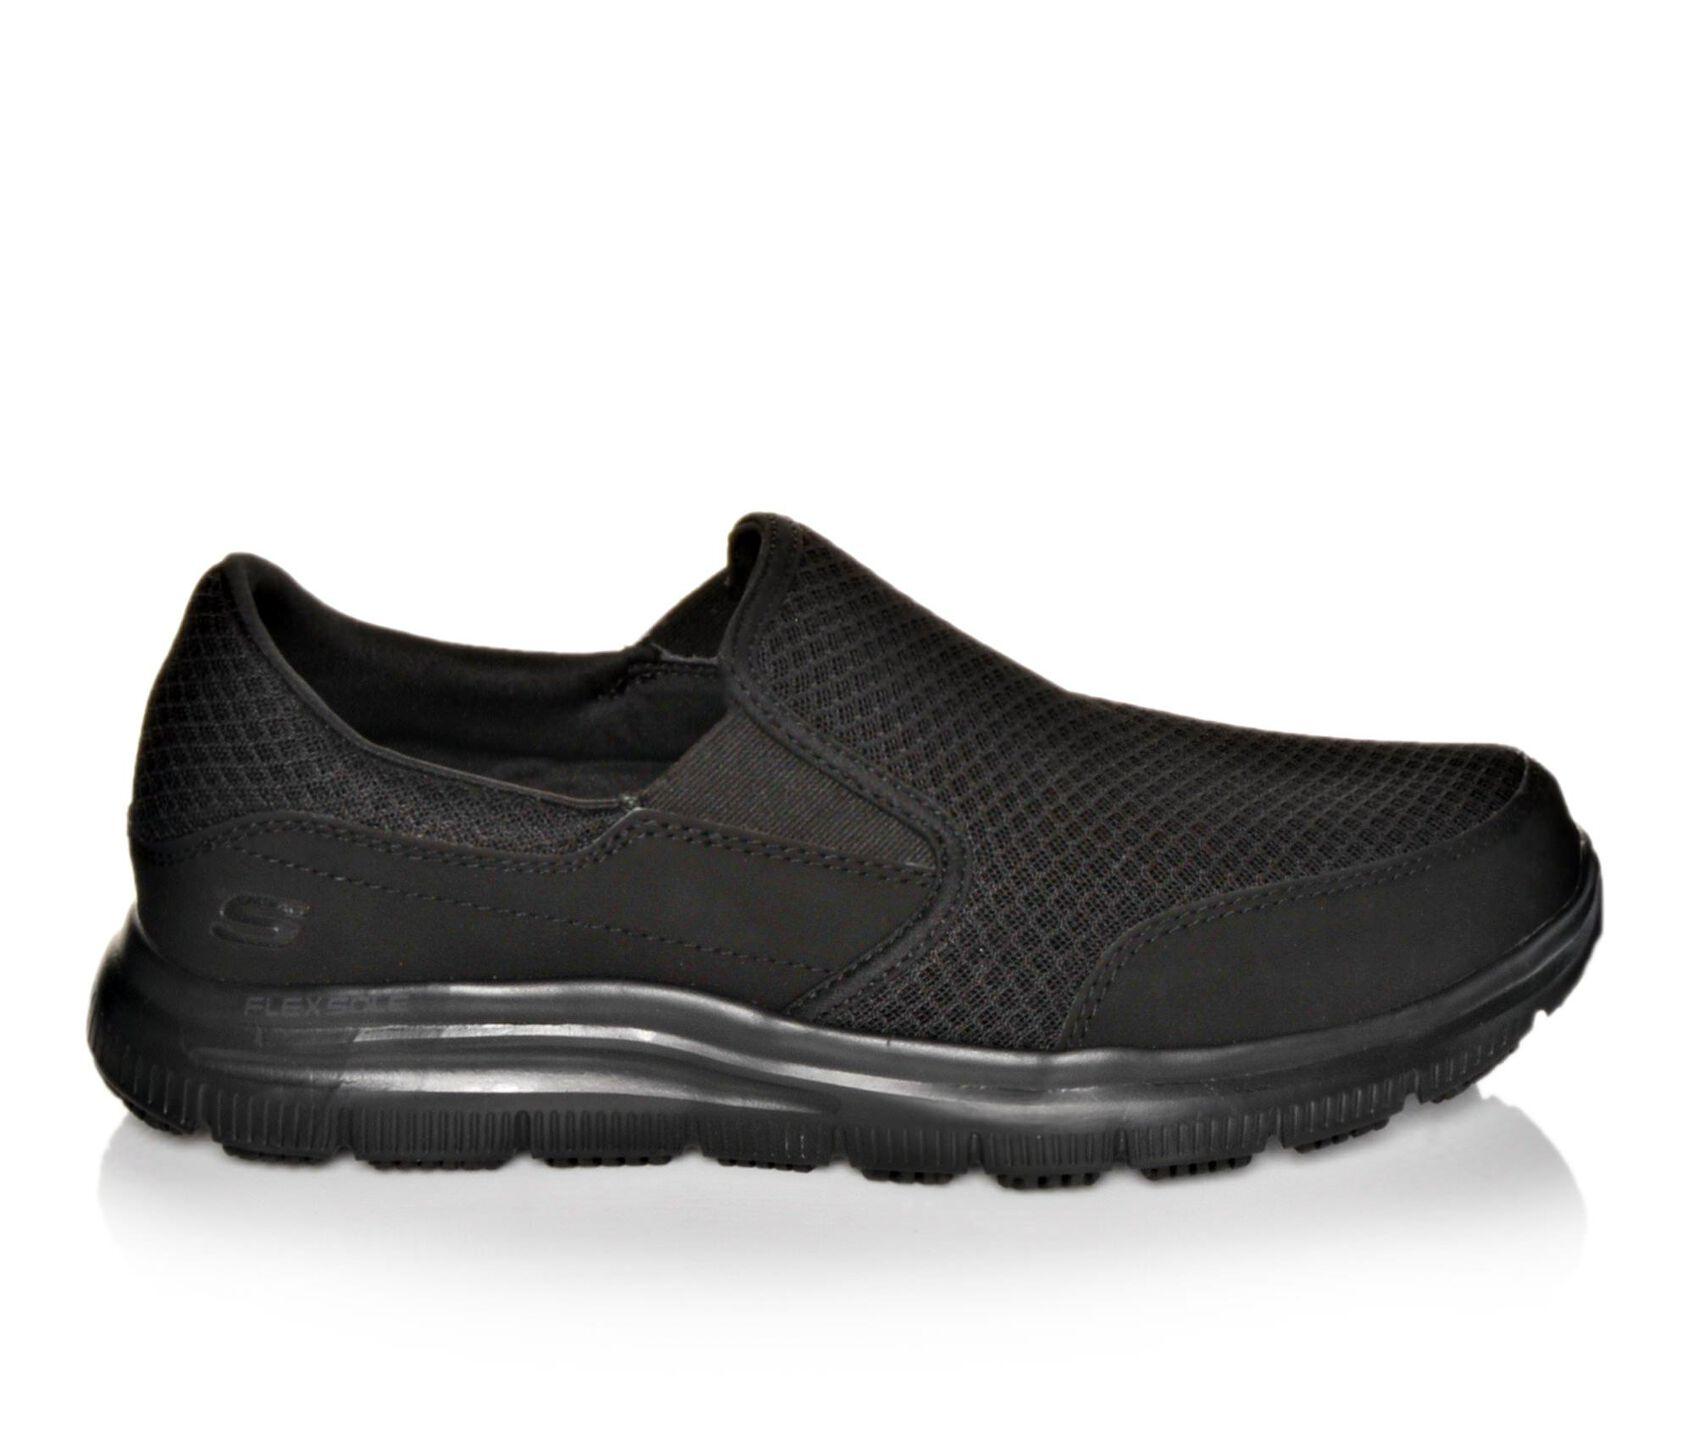 14115ade83a Men's Skechers Work 77048 McAllen Safety Shoes | Shoe Carnival